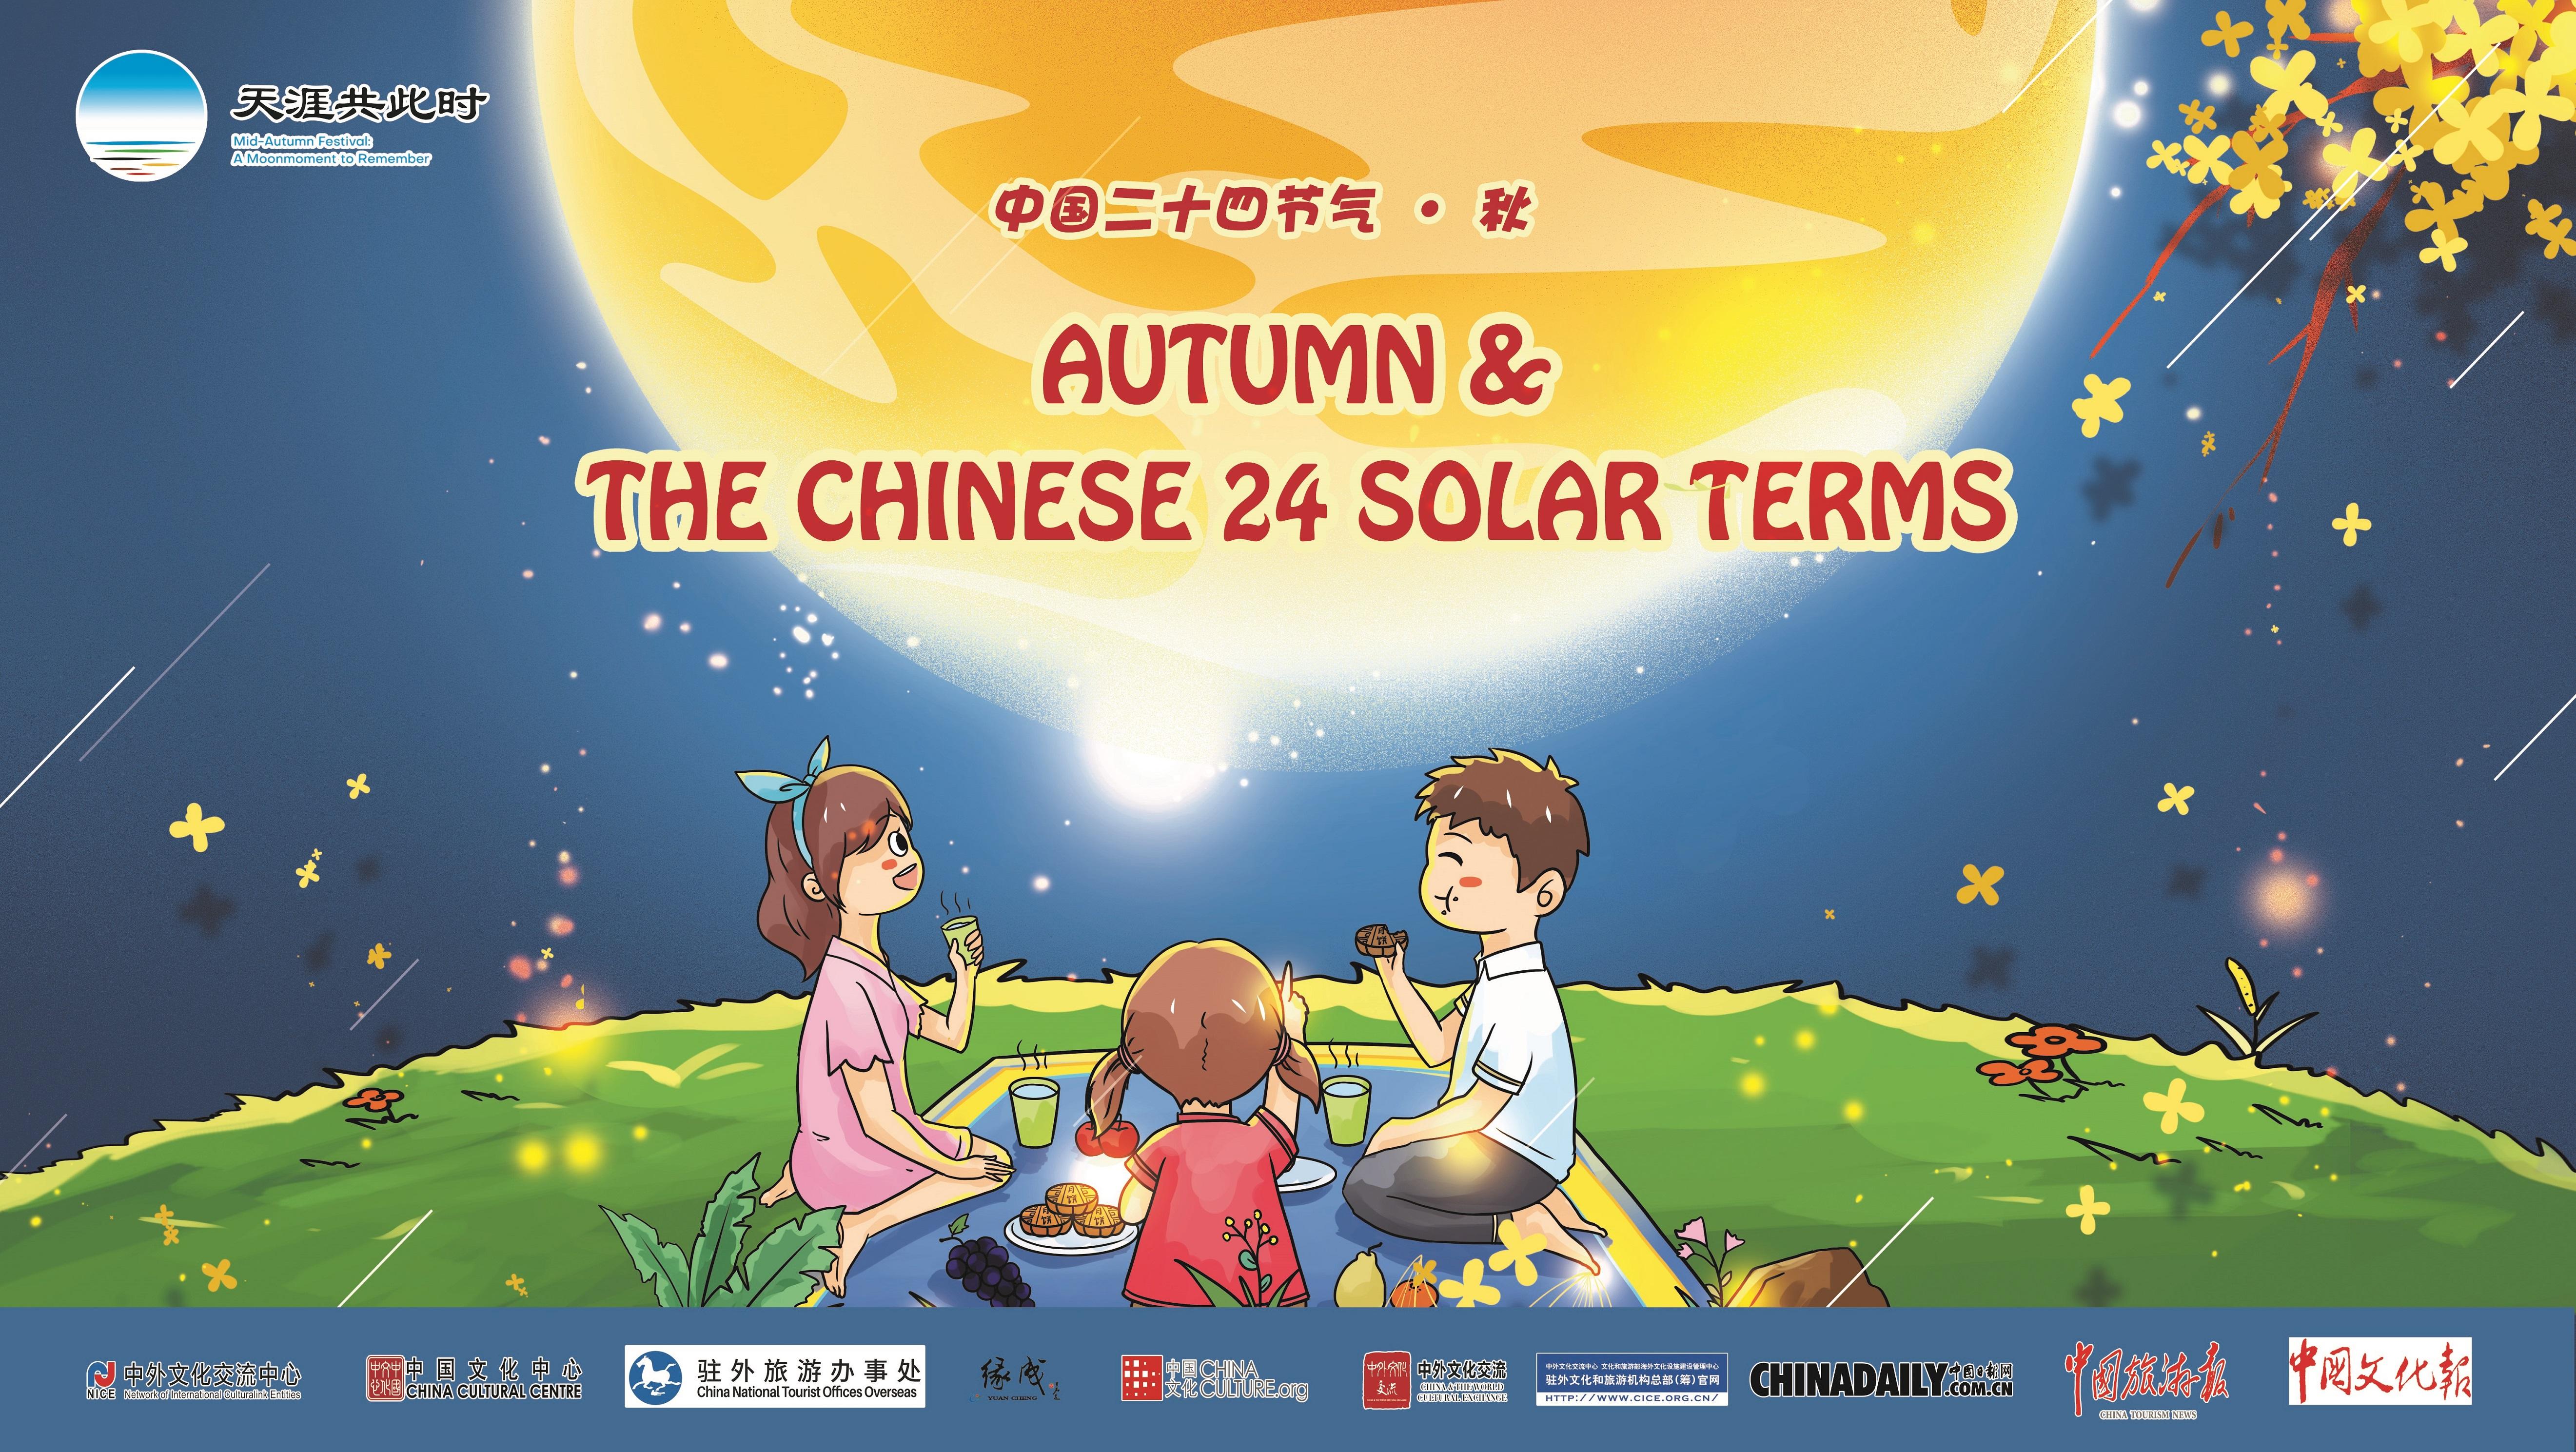 """中国二十四节气·秋""动画短视频  ""Autumn & The Chinese 24 Solar Terms"""